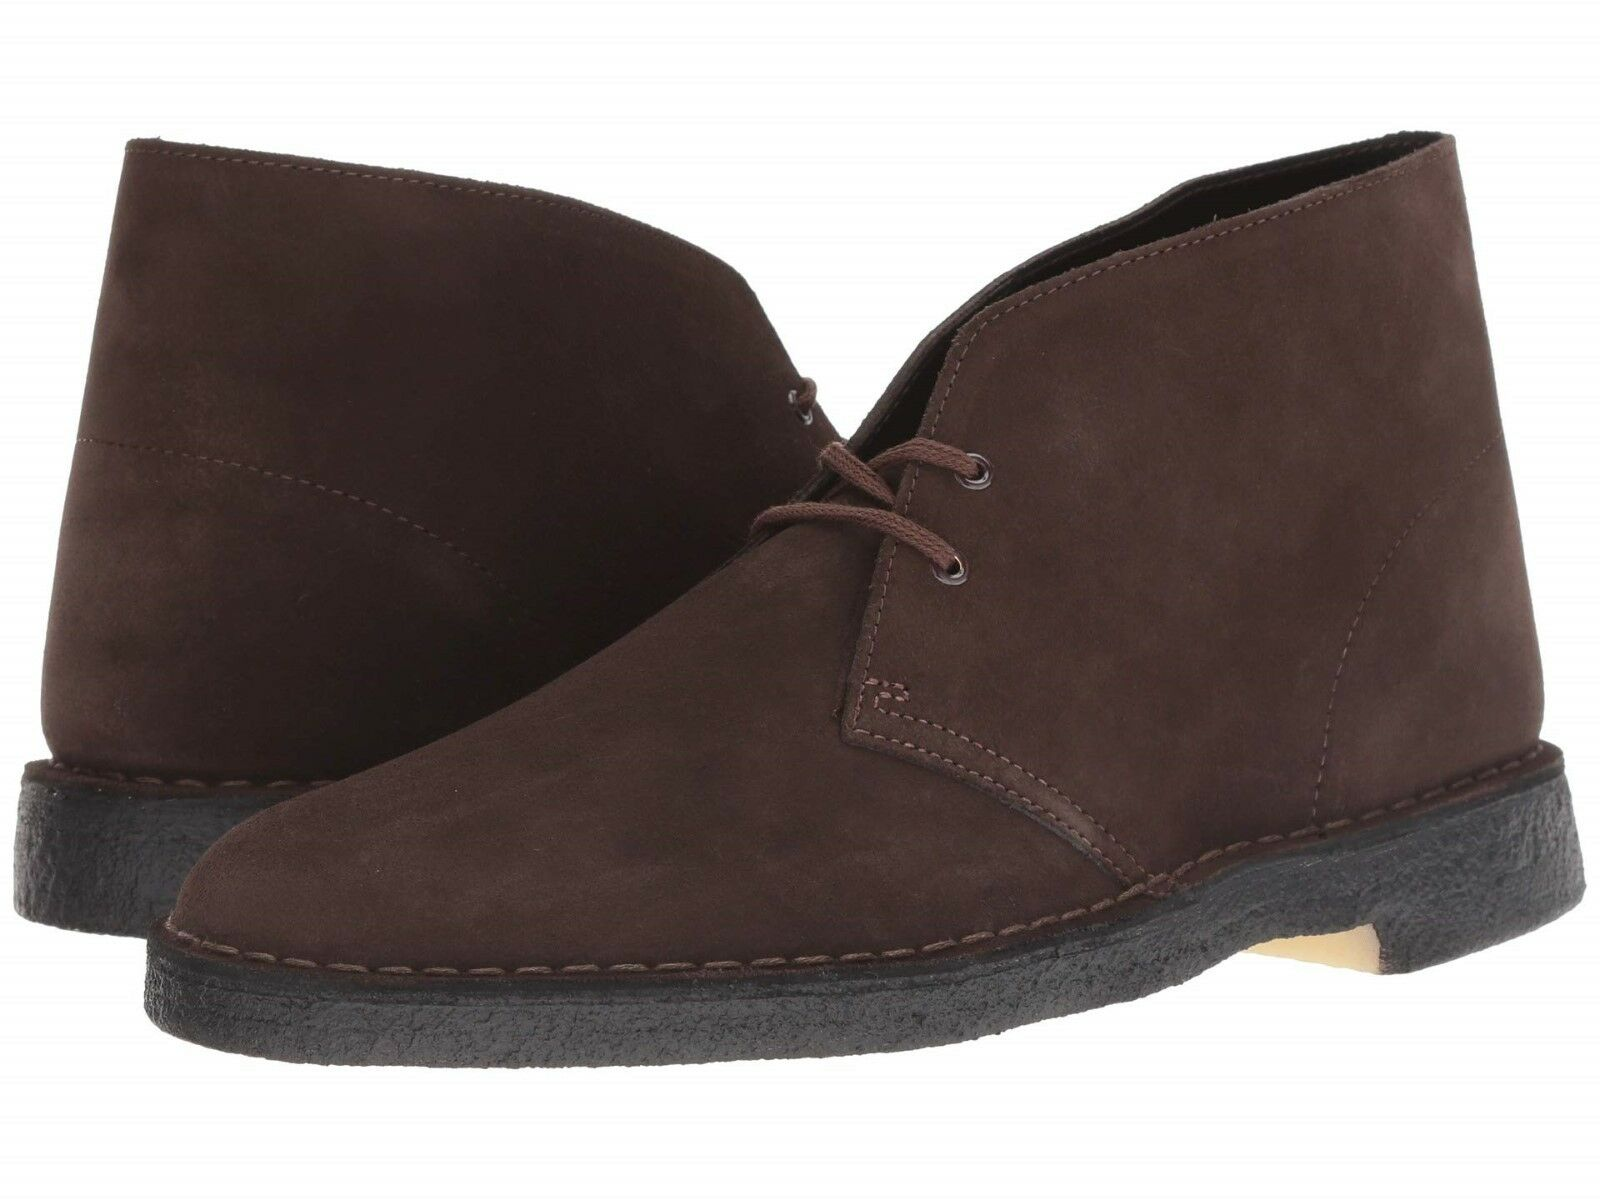 Clarks Mens Original Desert Boot Brown Suede Leather Medium (D, M)